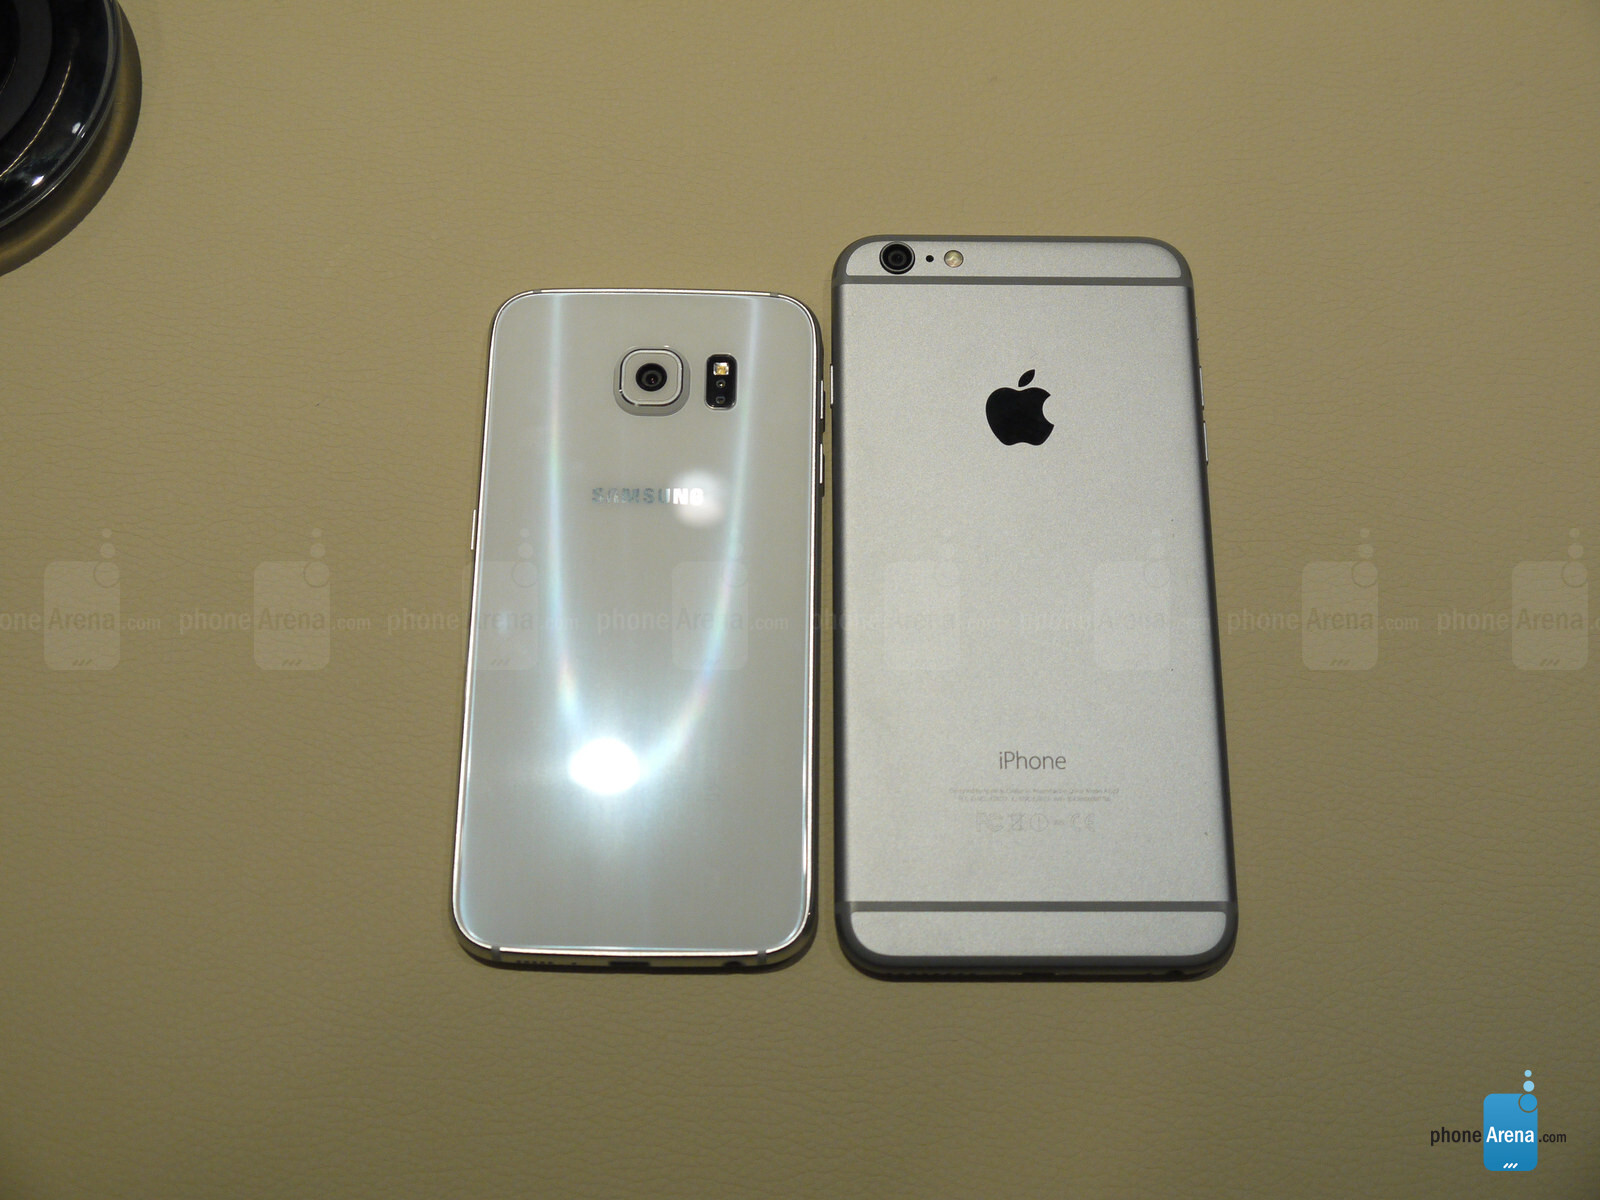 iphone 6 plus vs galaxy s6